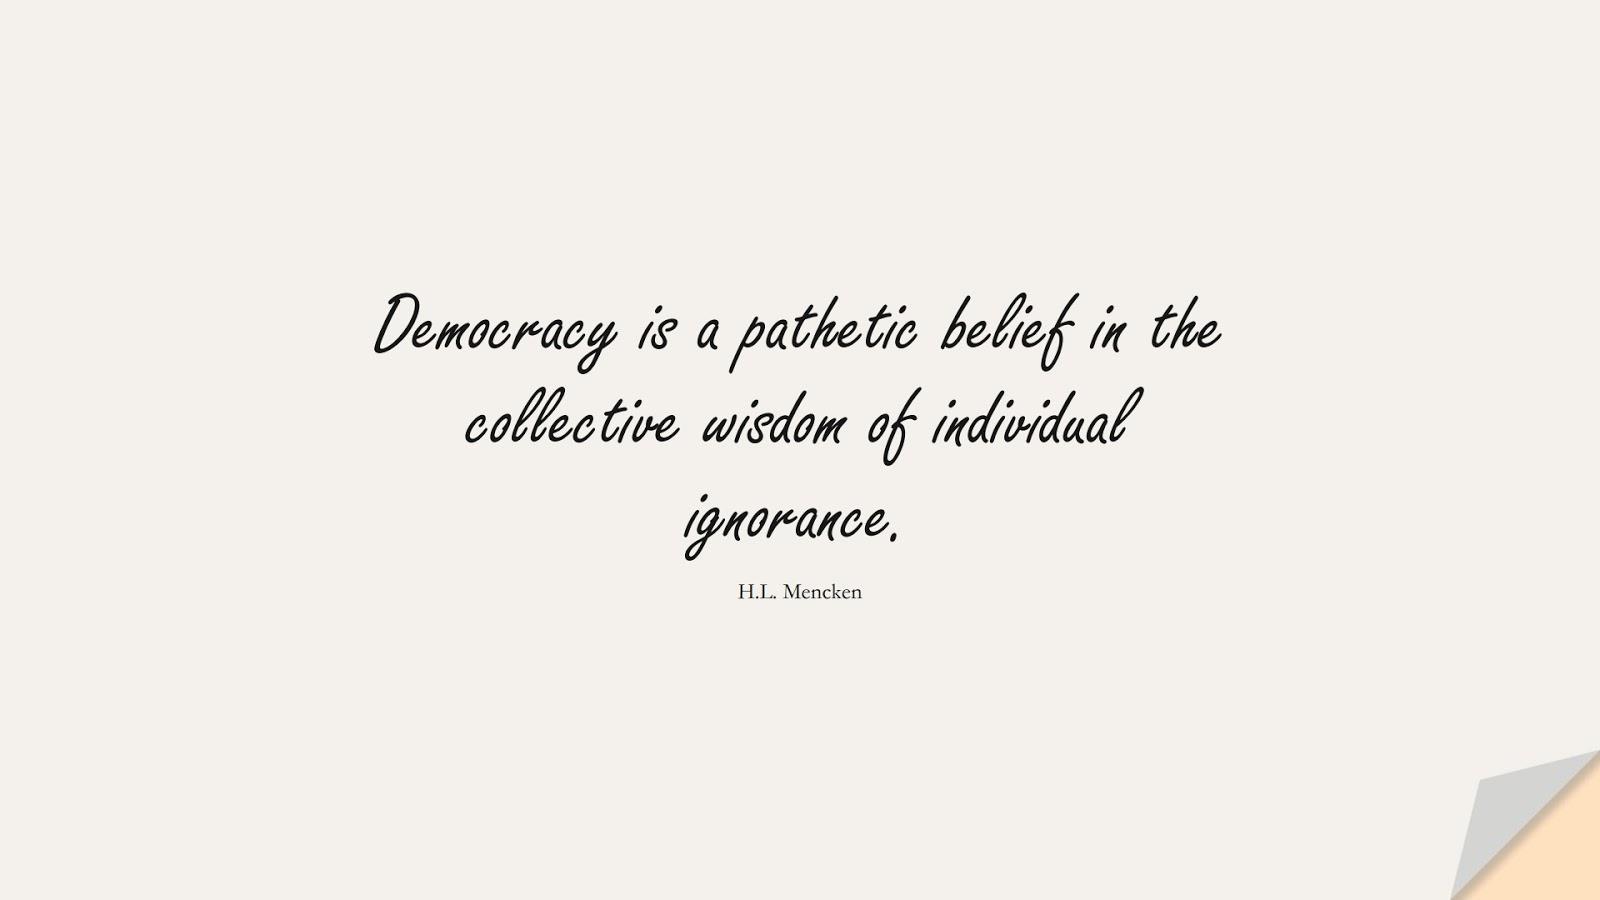 Democracy is a pathetic belief in the collective wisdom of individual ignorance. (H.L. Mencken);  #WordsofWisdom